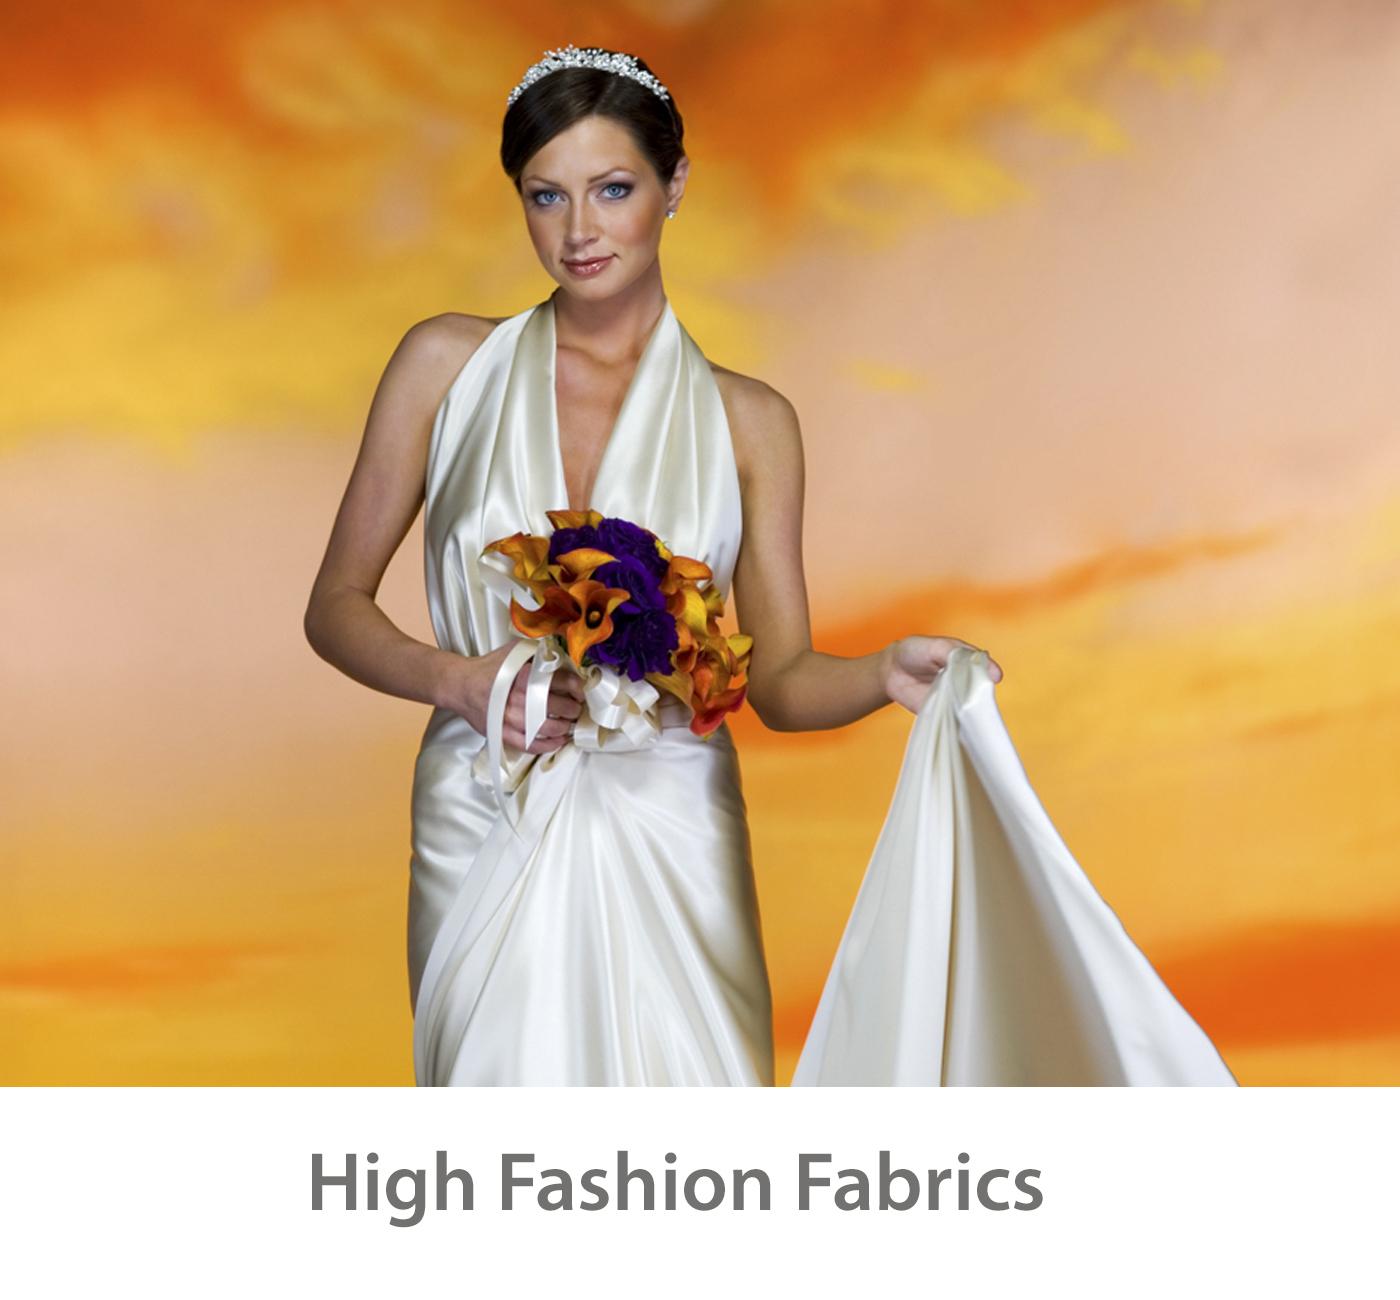 High Fashion Fabrics